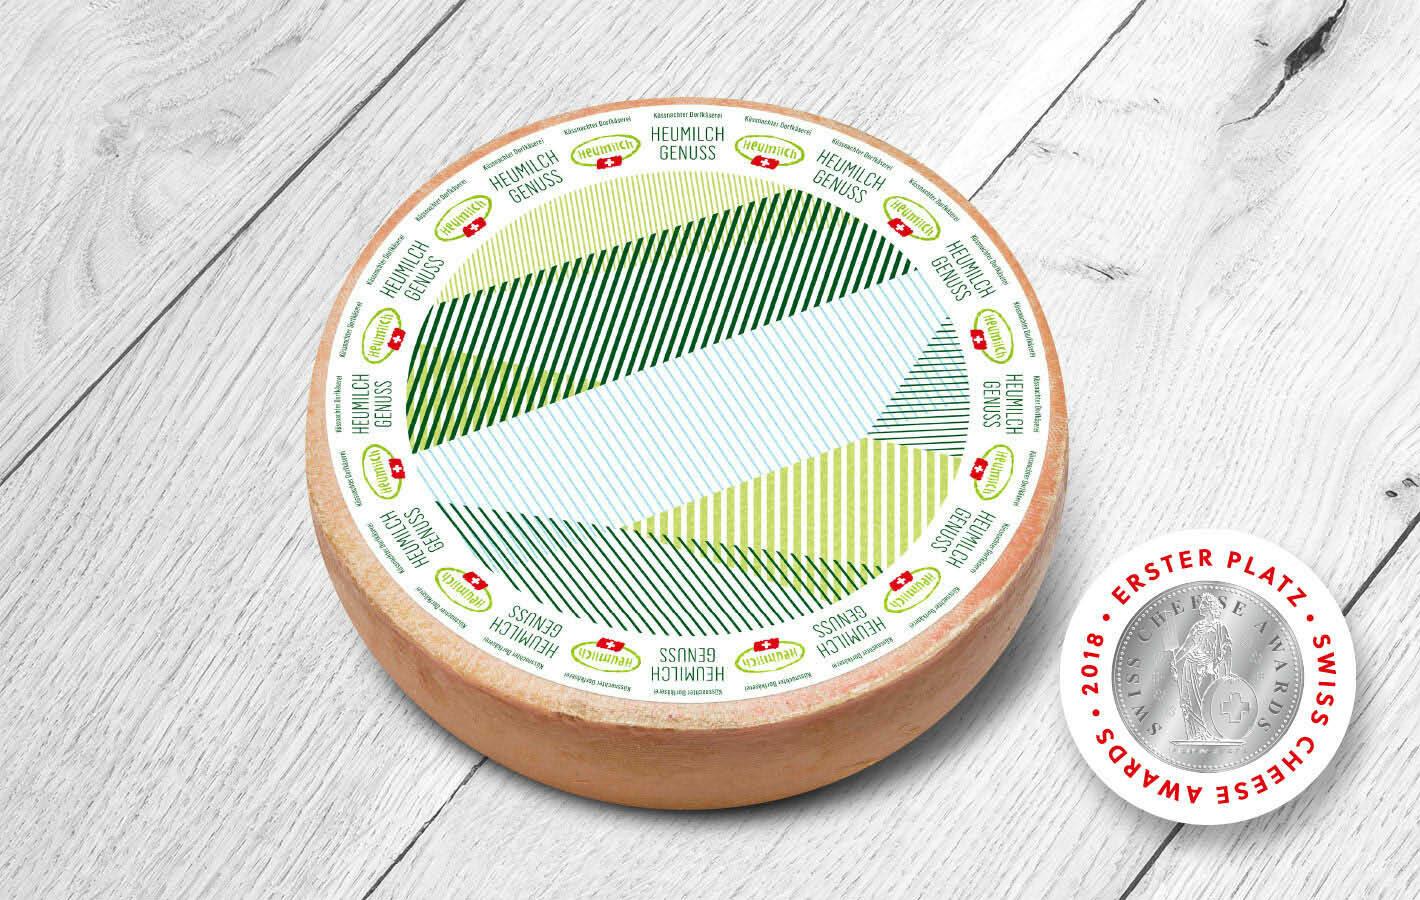 Heumilch Genuss Käse - laktosefrei (500g)